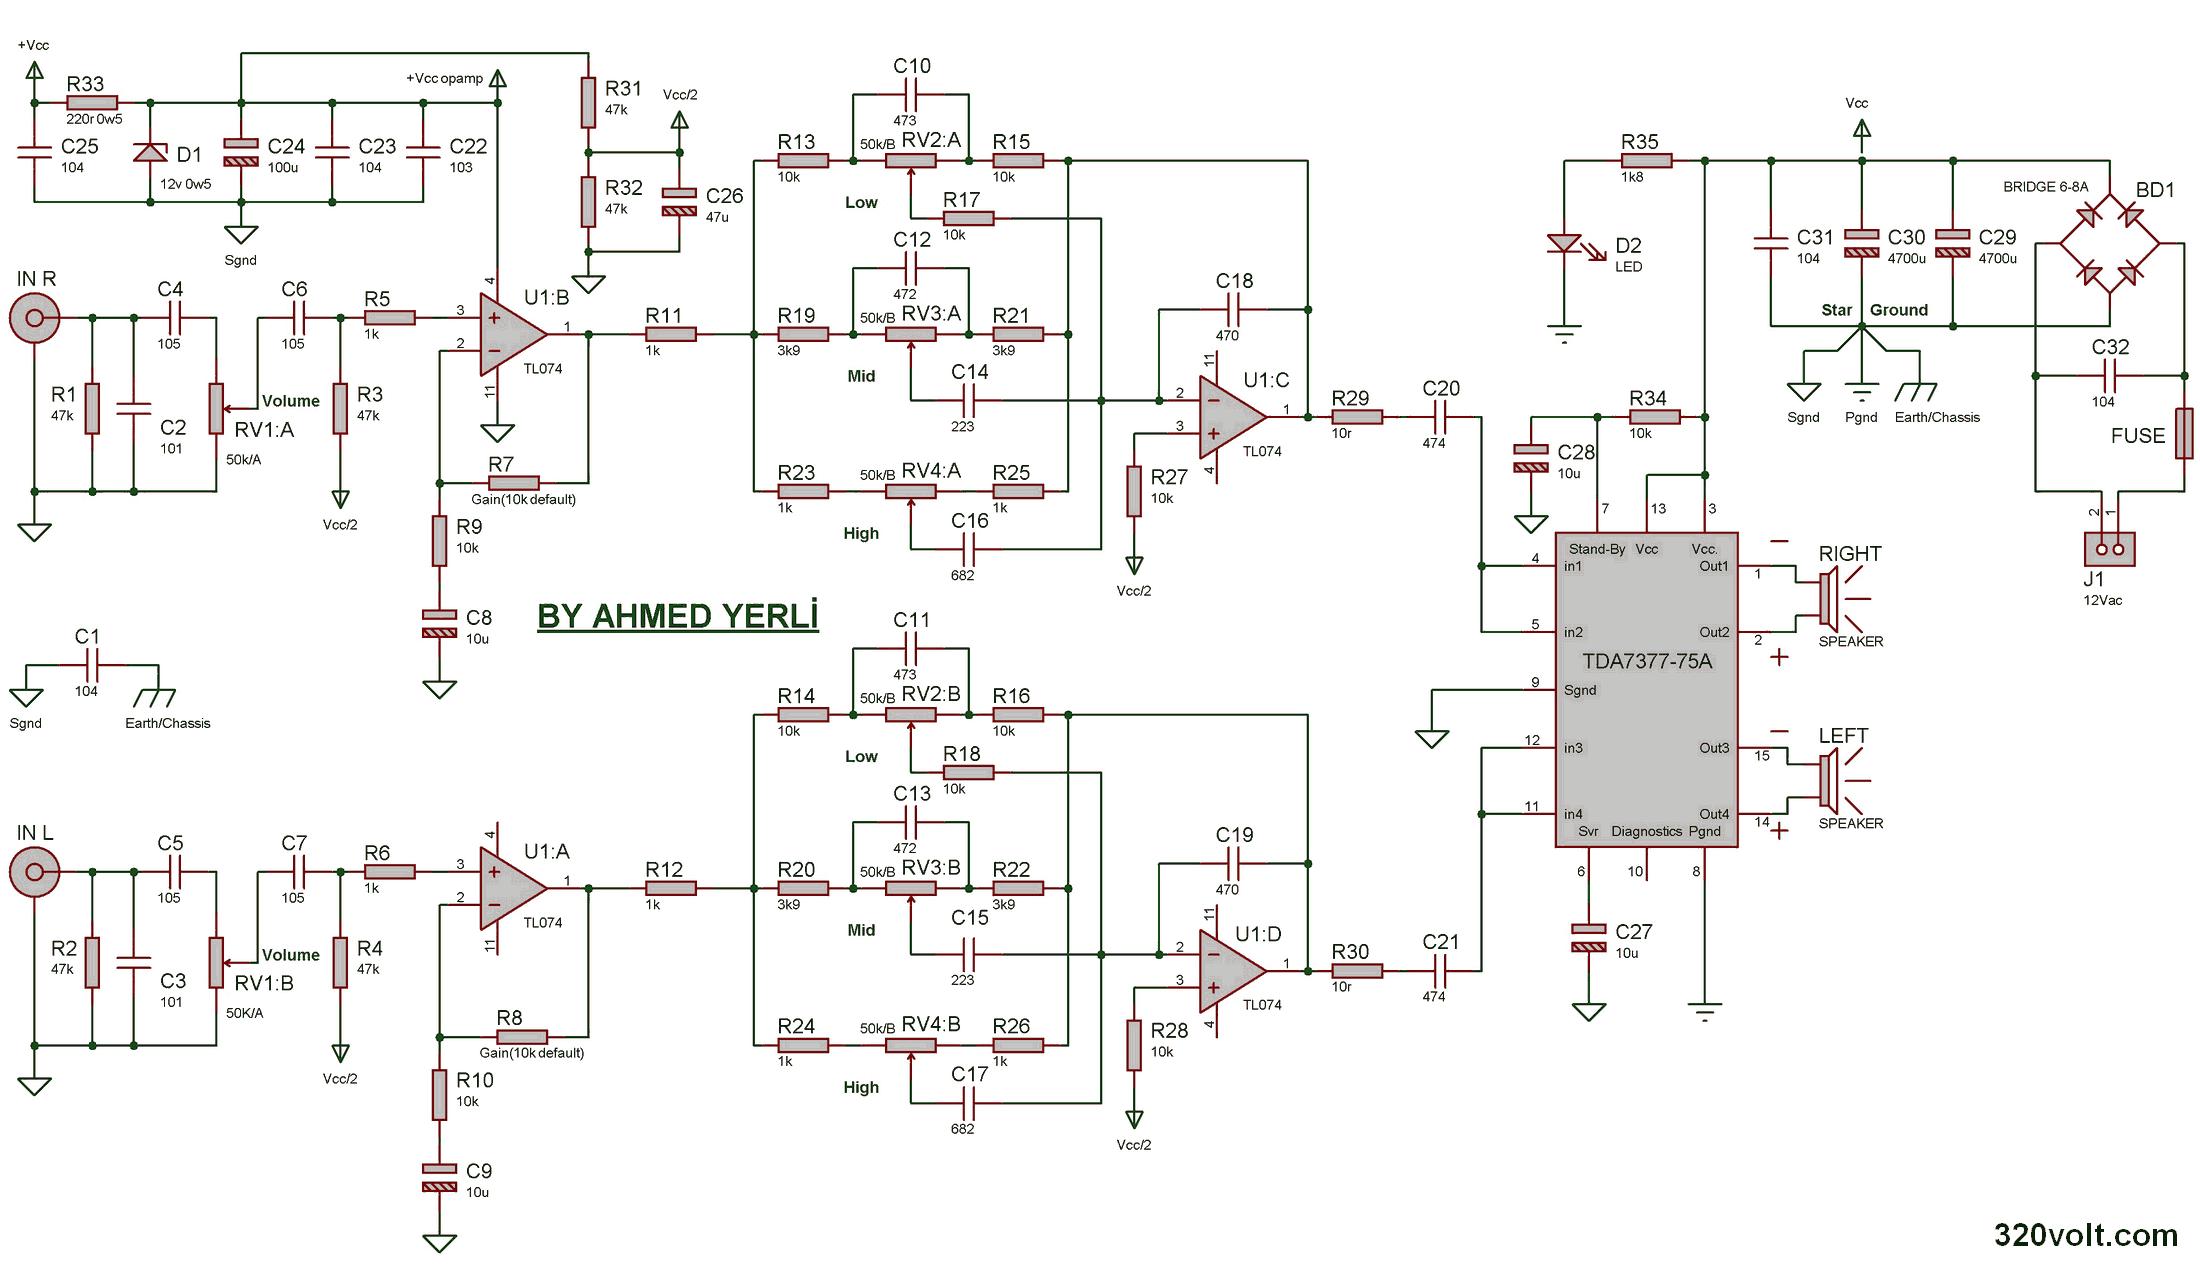 Pin By Tushar Khambhayta On Car Audio Amplifier Pinterest Circuit Diagram For